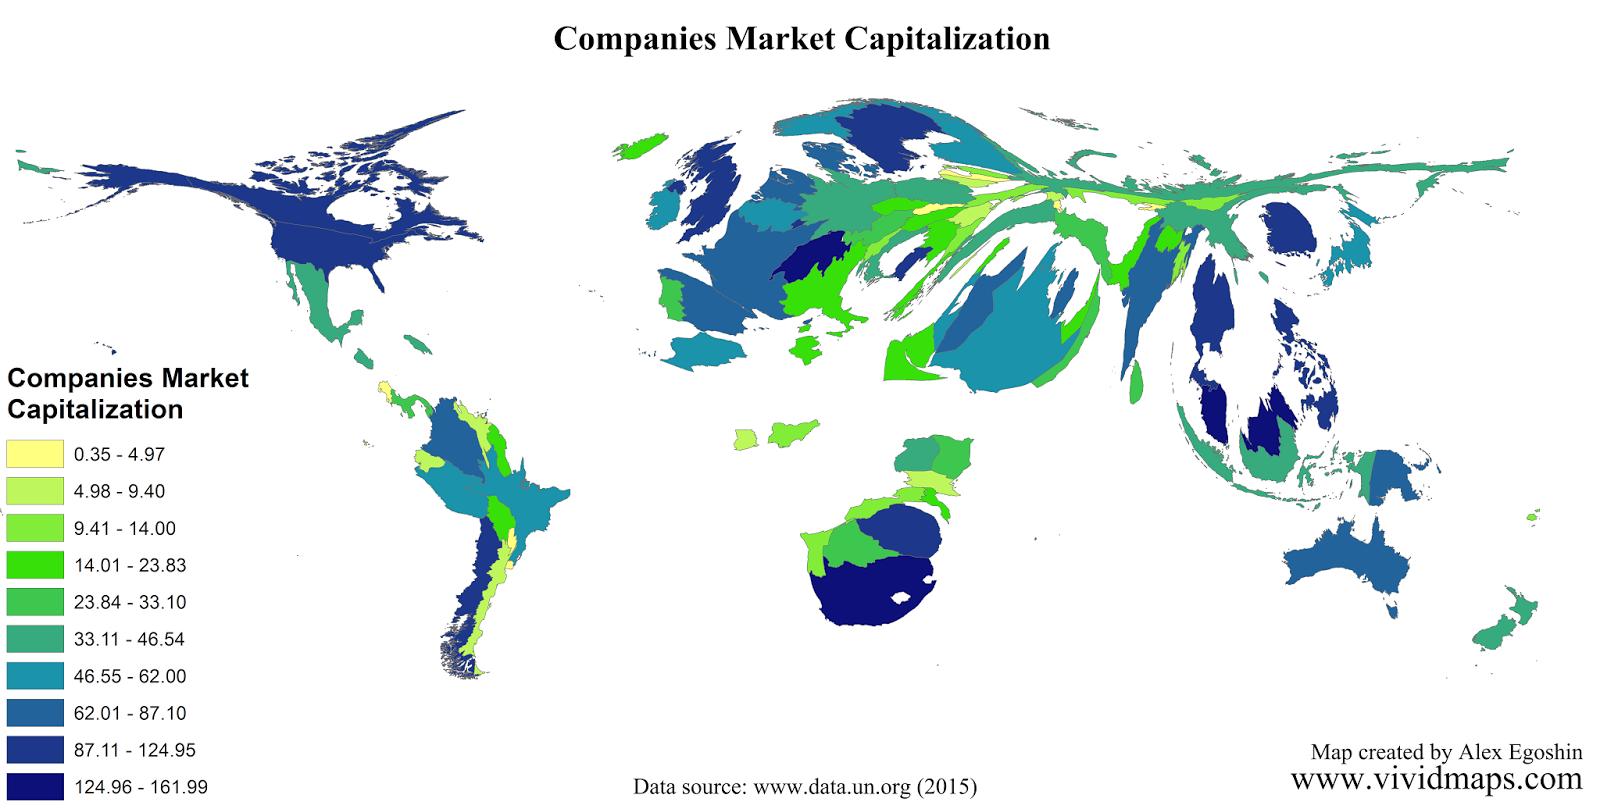 Companies market capitalization